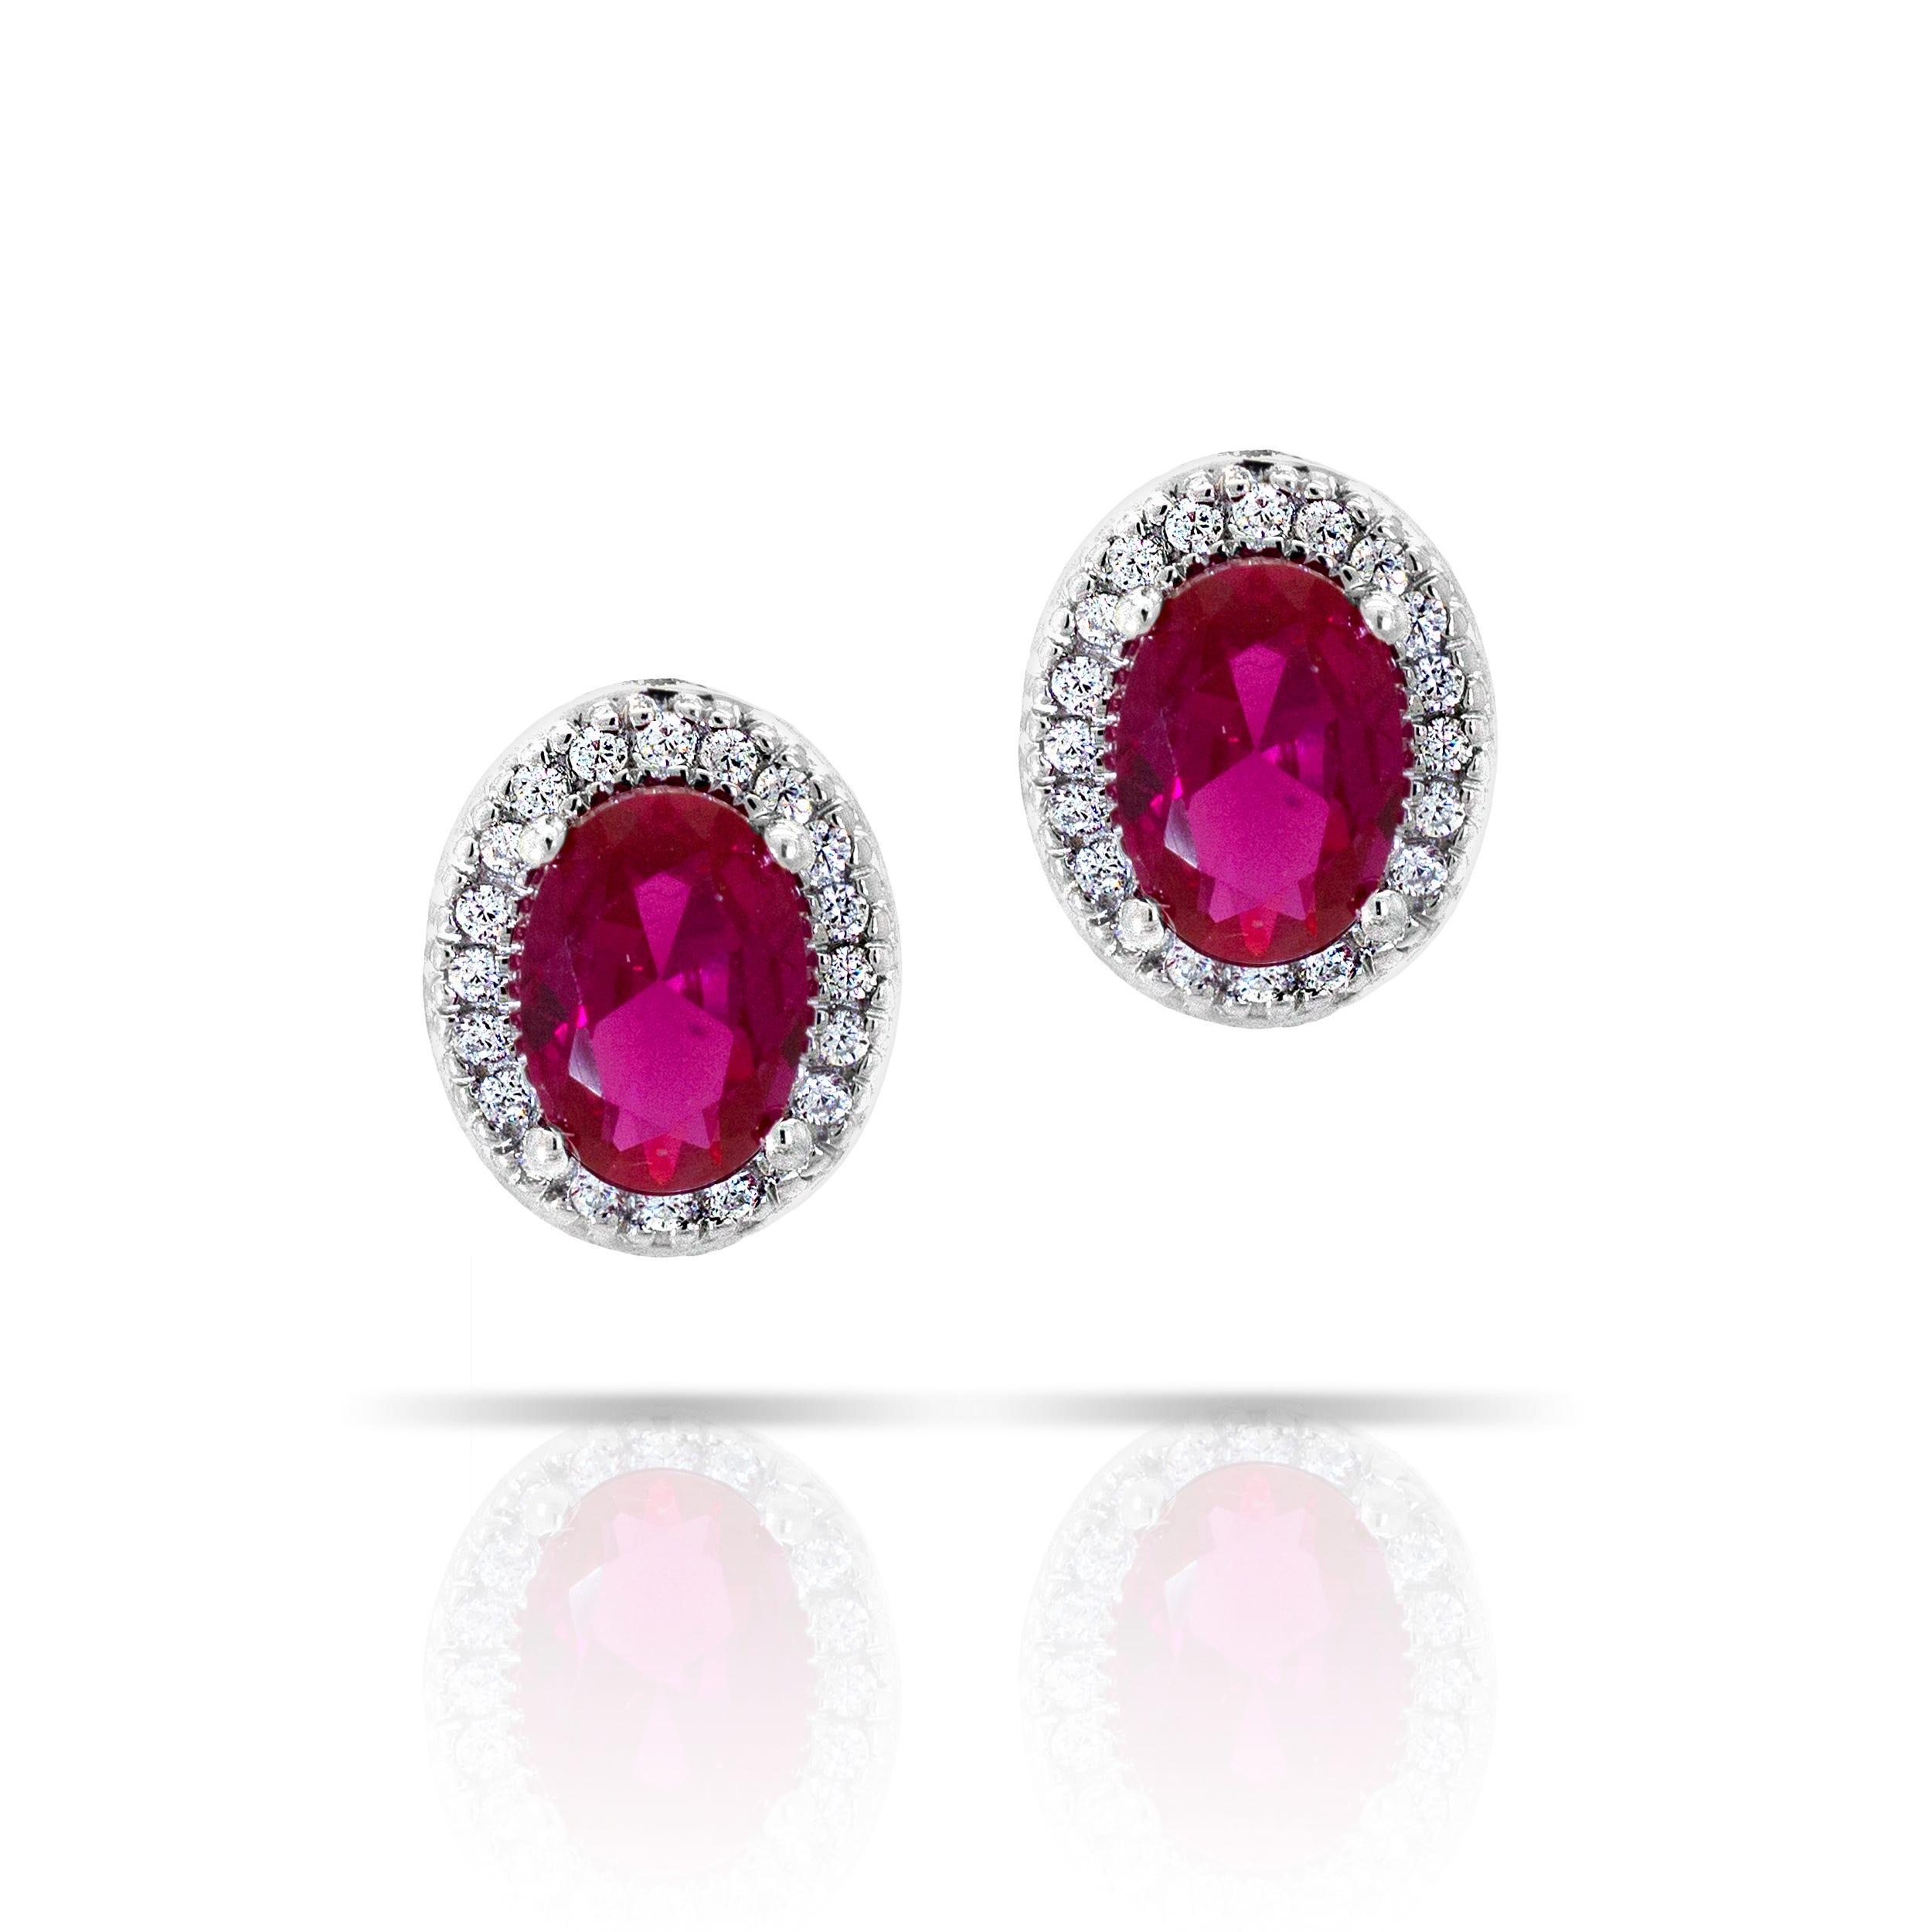 Oval Created Ruby & Diamond Earrings in Sterling Silver